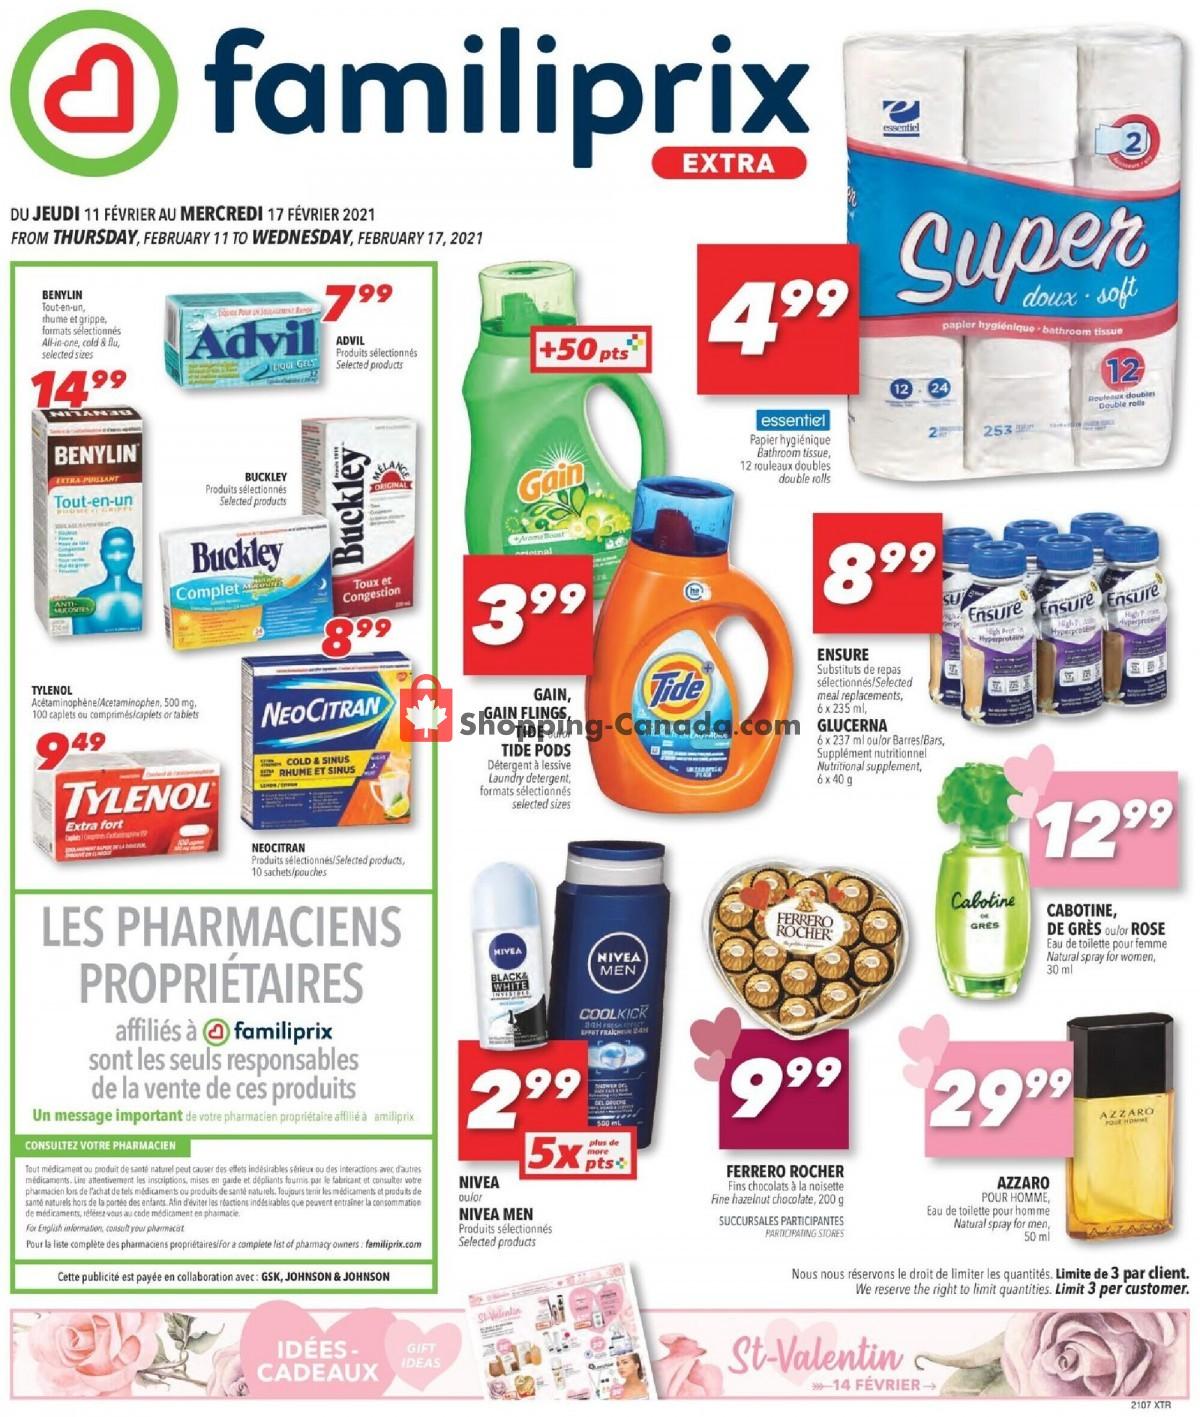 Flyer Familiprix Canada - from Thursday February 11, 2021 to Wednesday February 17, 2021